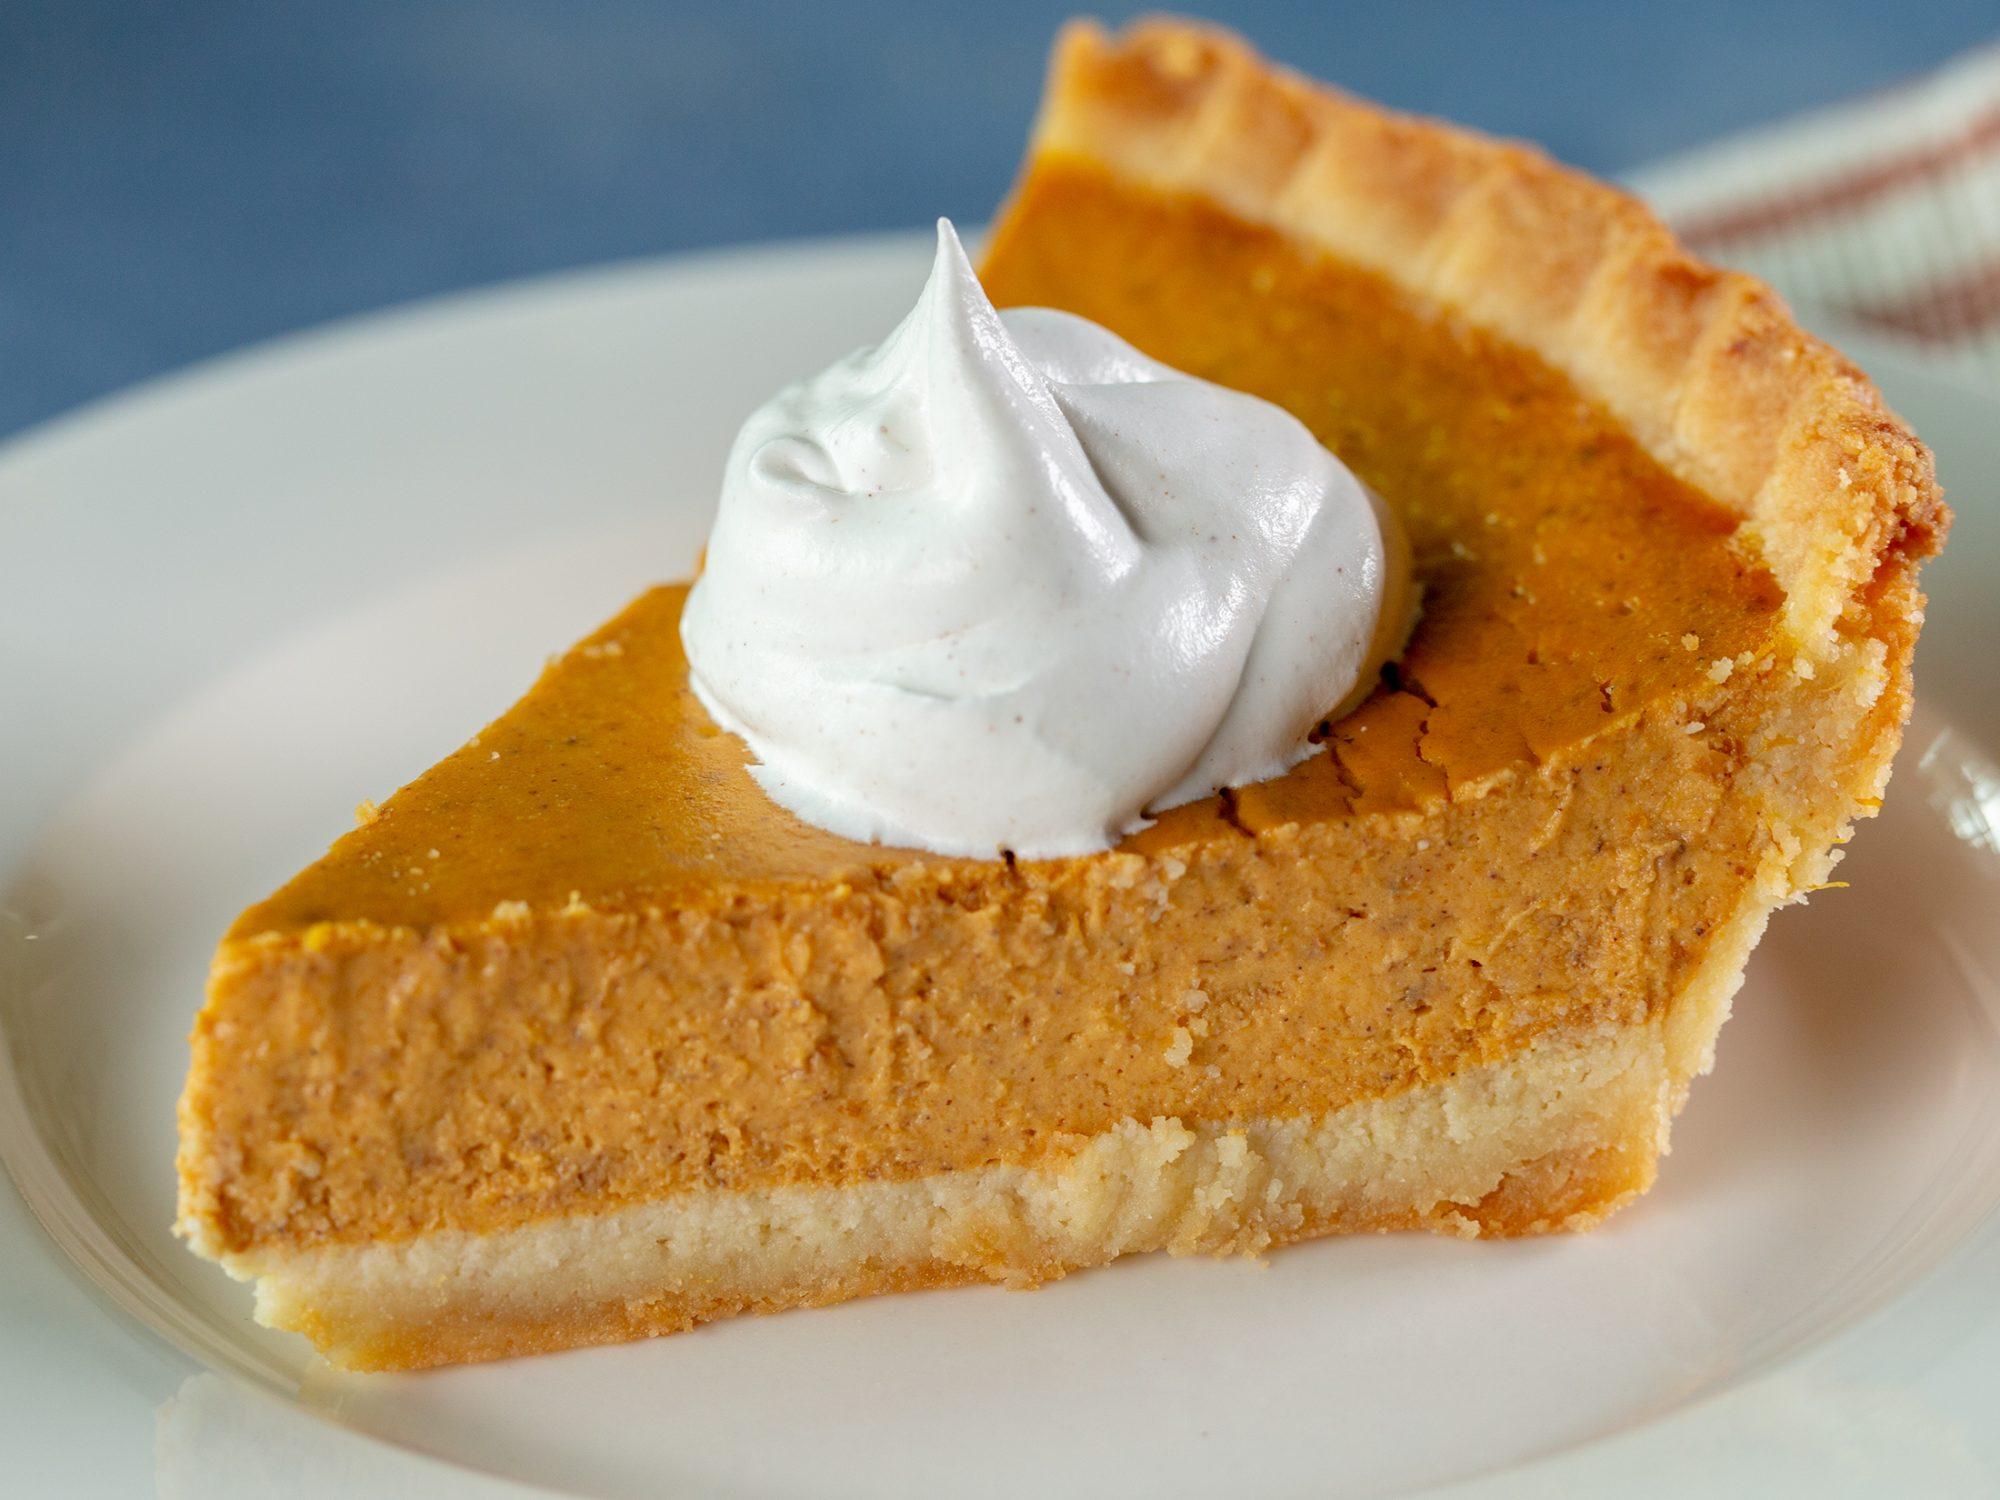 Keto Pumpkin Pie image